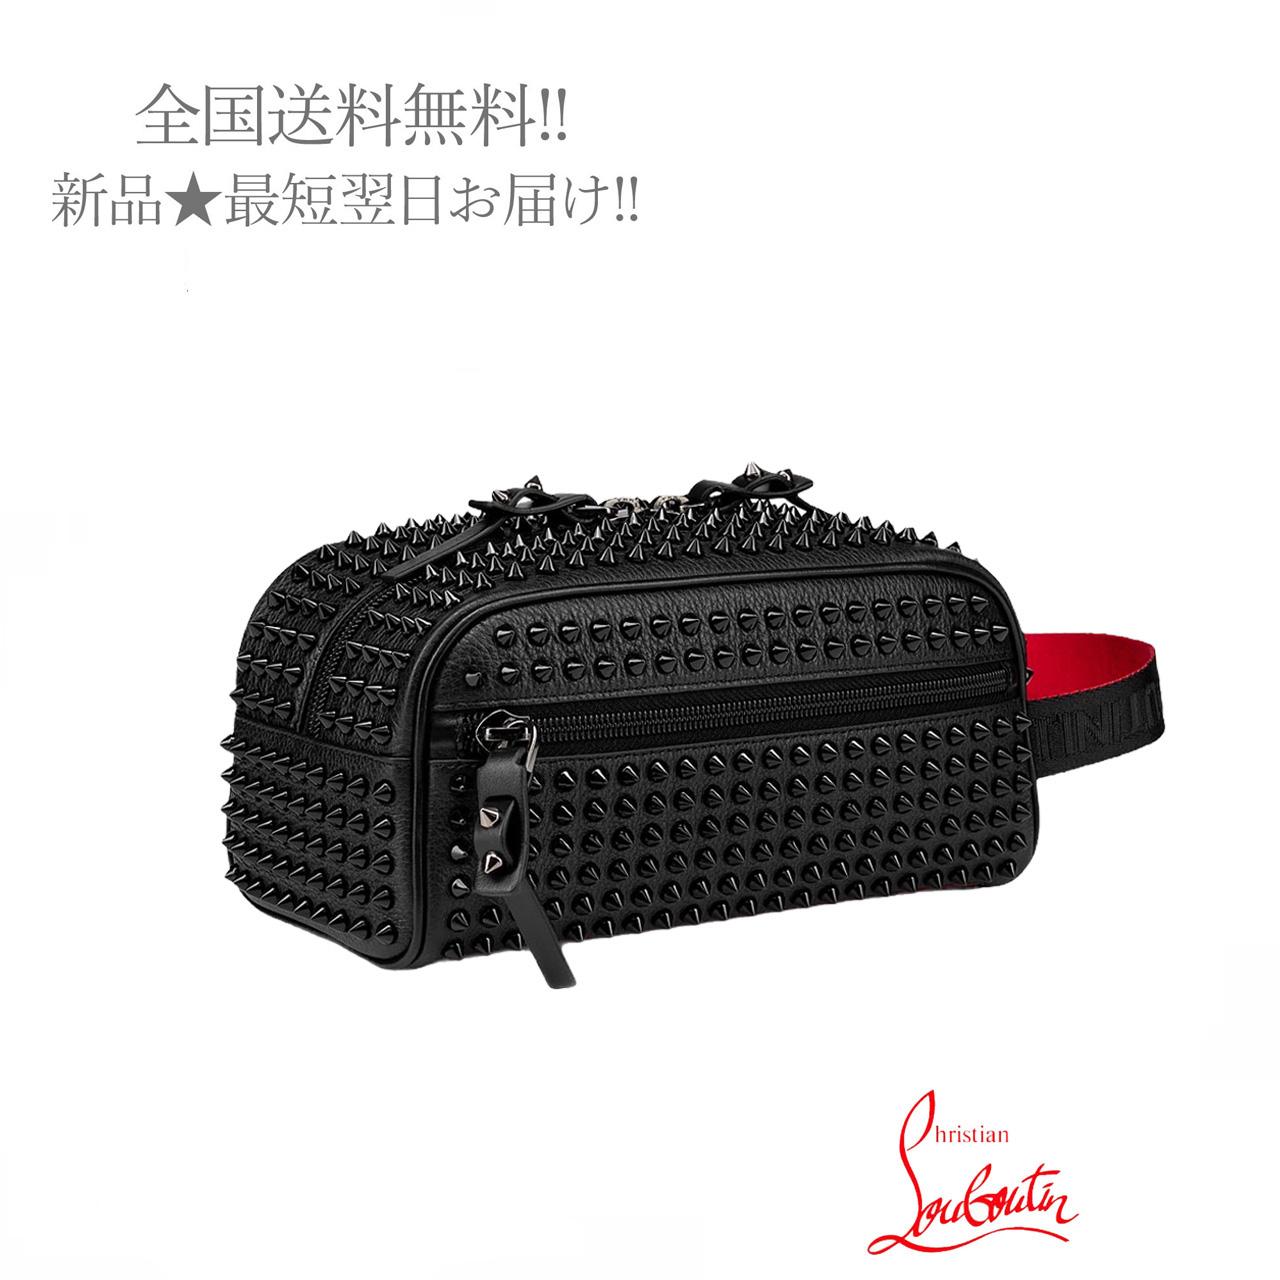 Christian LouBoutin クリスチャン ルブタン Blaster ハンドルバッグ 新品 SNEAKERS BAG 格安 価格でご提供いたします BLACK 与え 男 メンズ